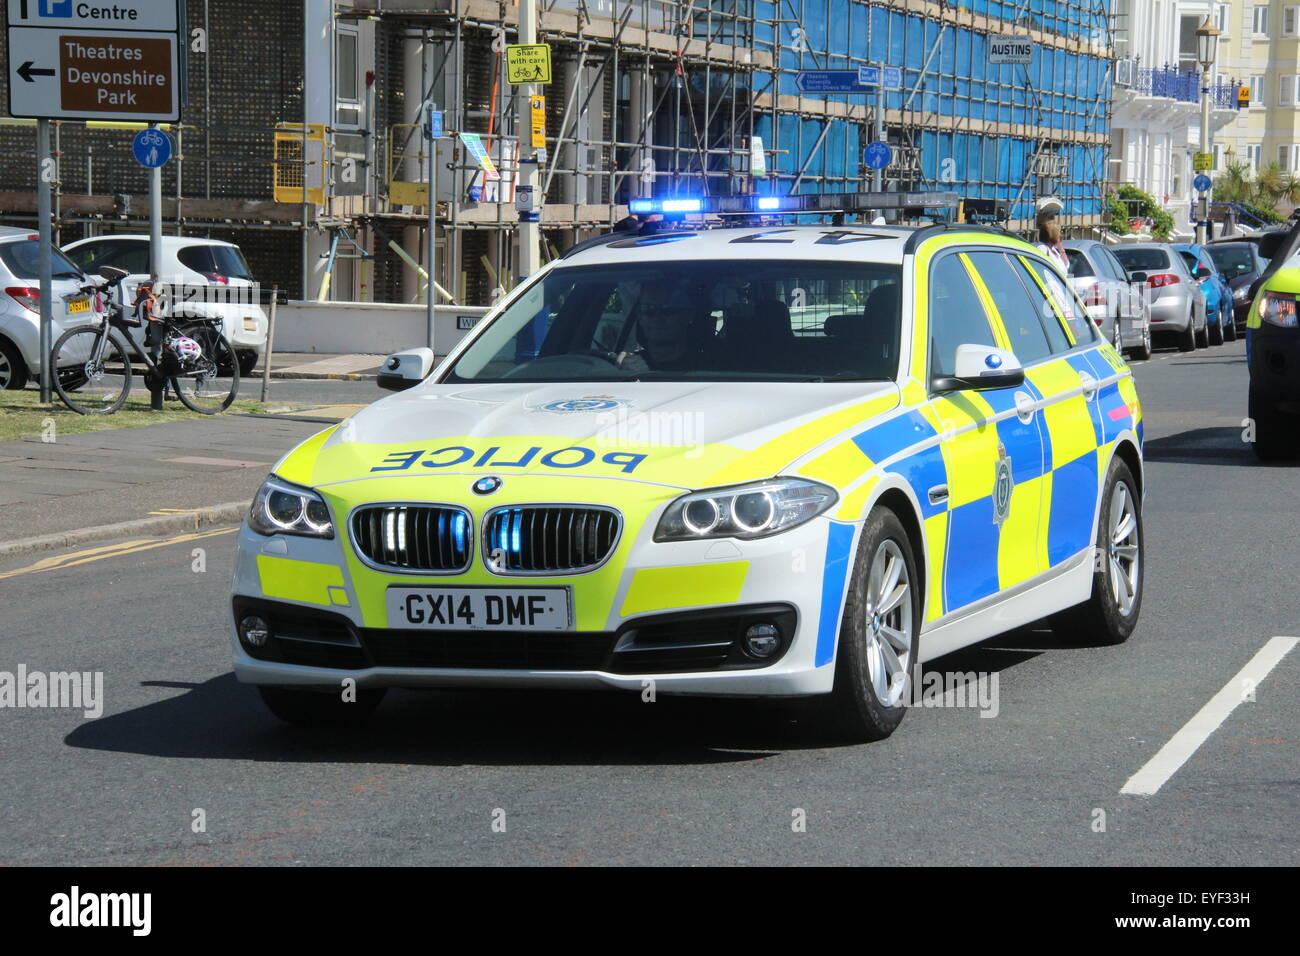 blue police vans uk